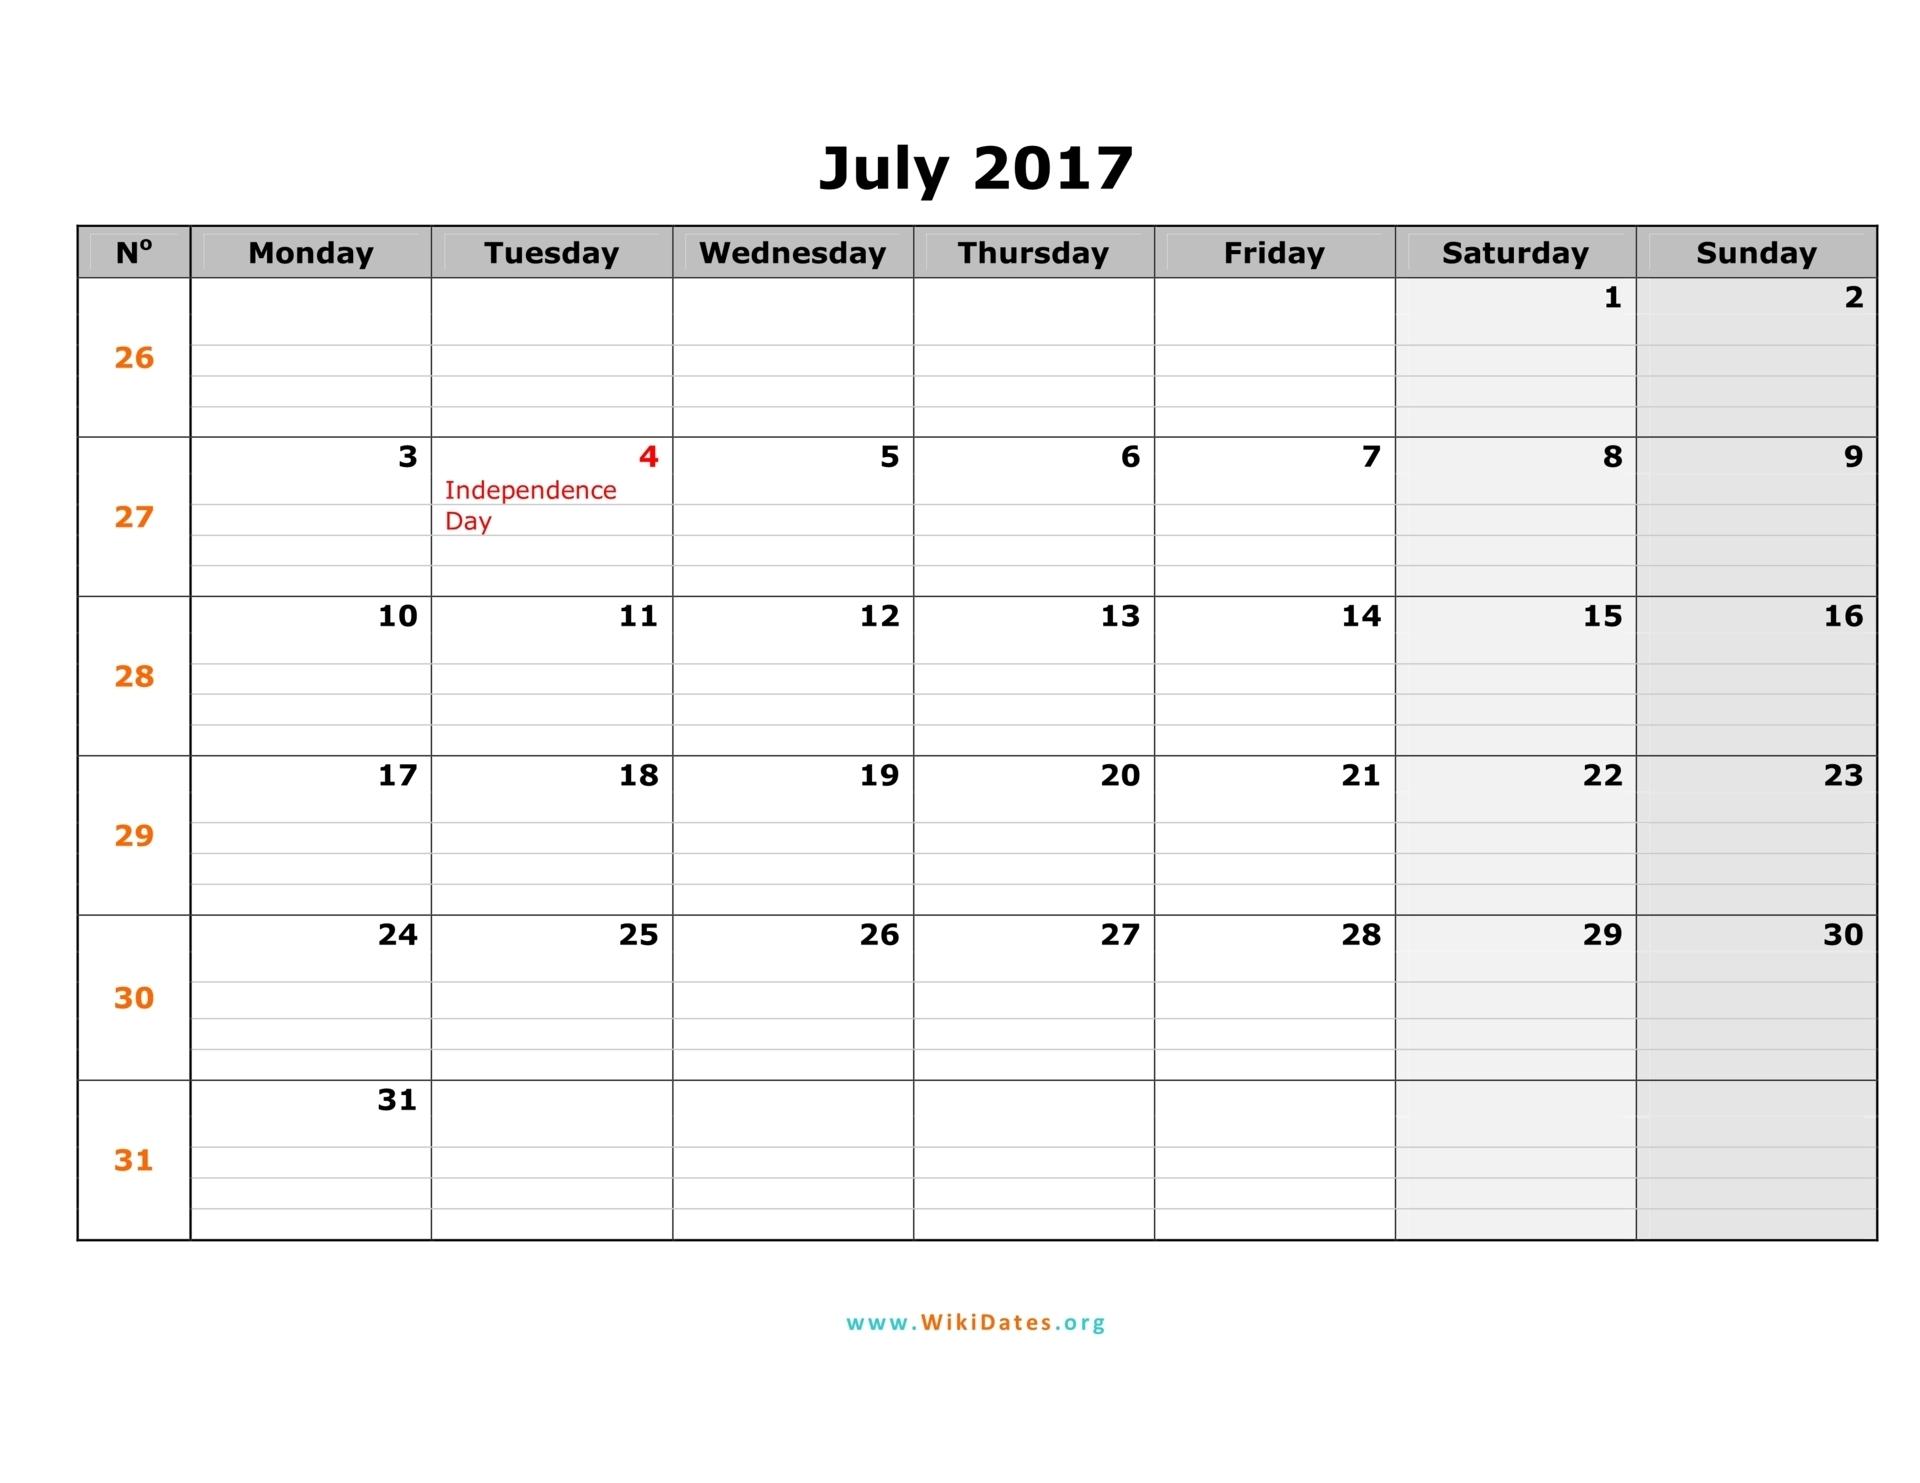 July 2017 Calendar Editable3abry